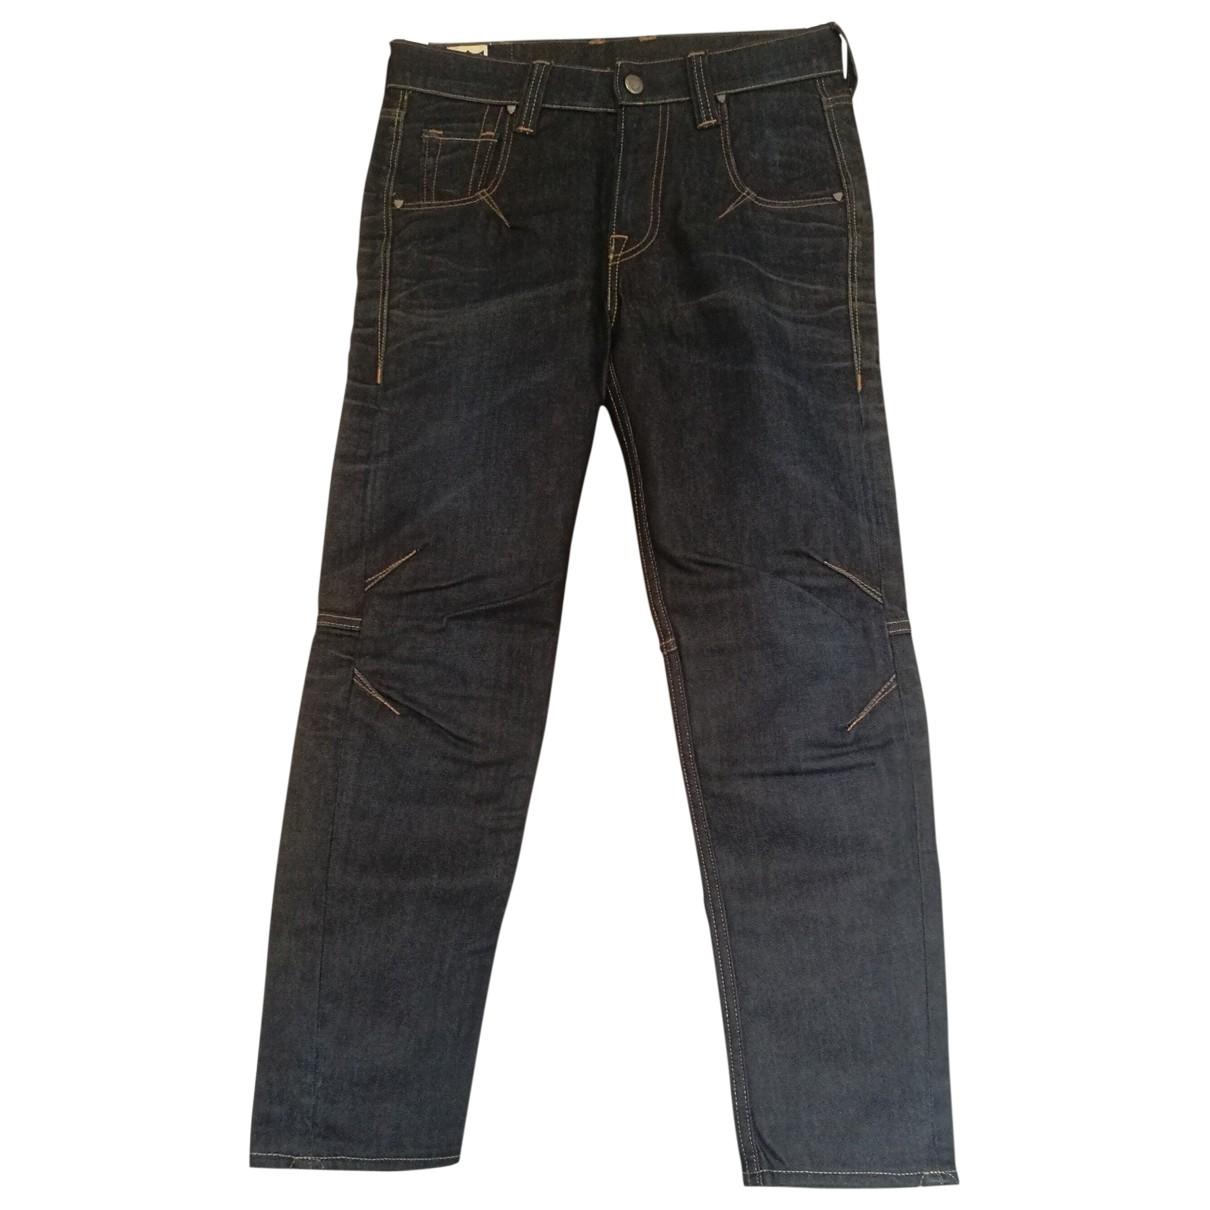 Htc \N Blue Denim - Jeans Jeans for Women 26 US